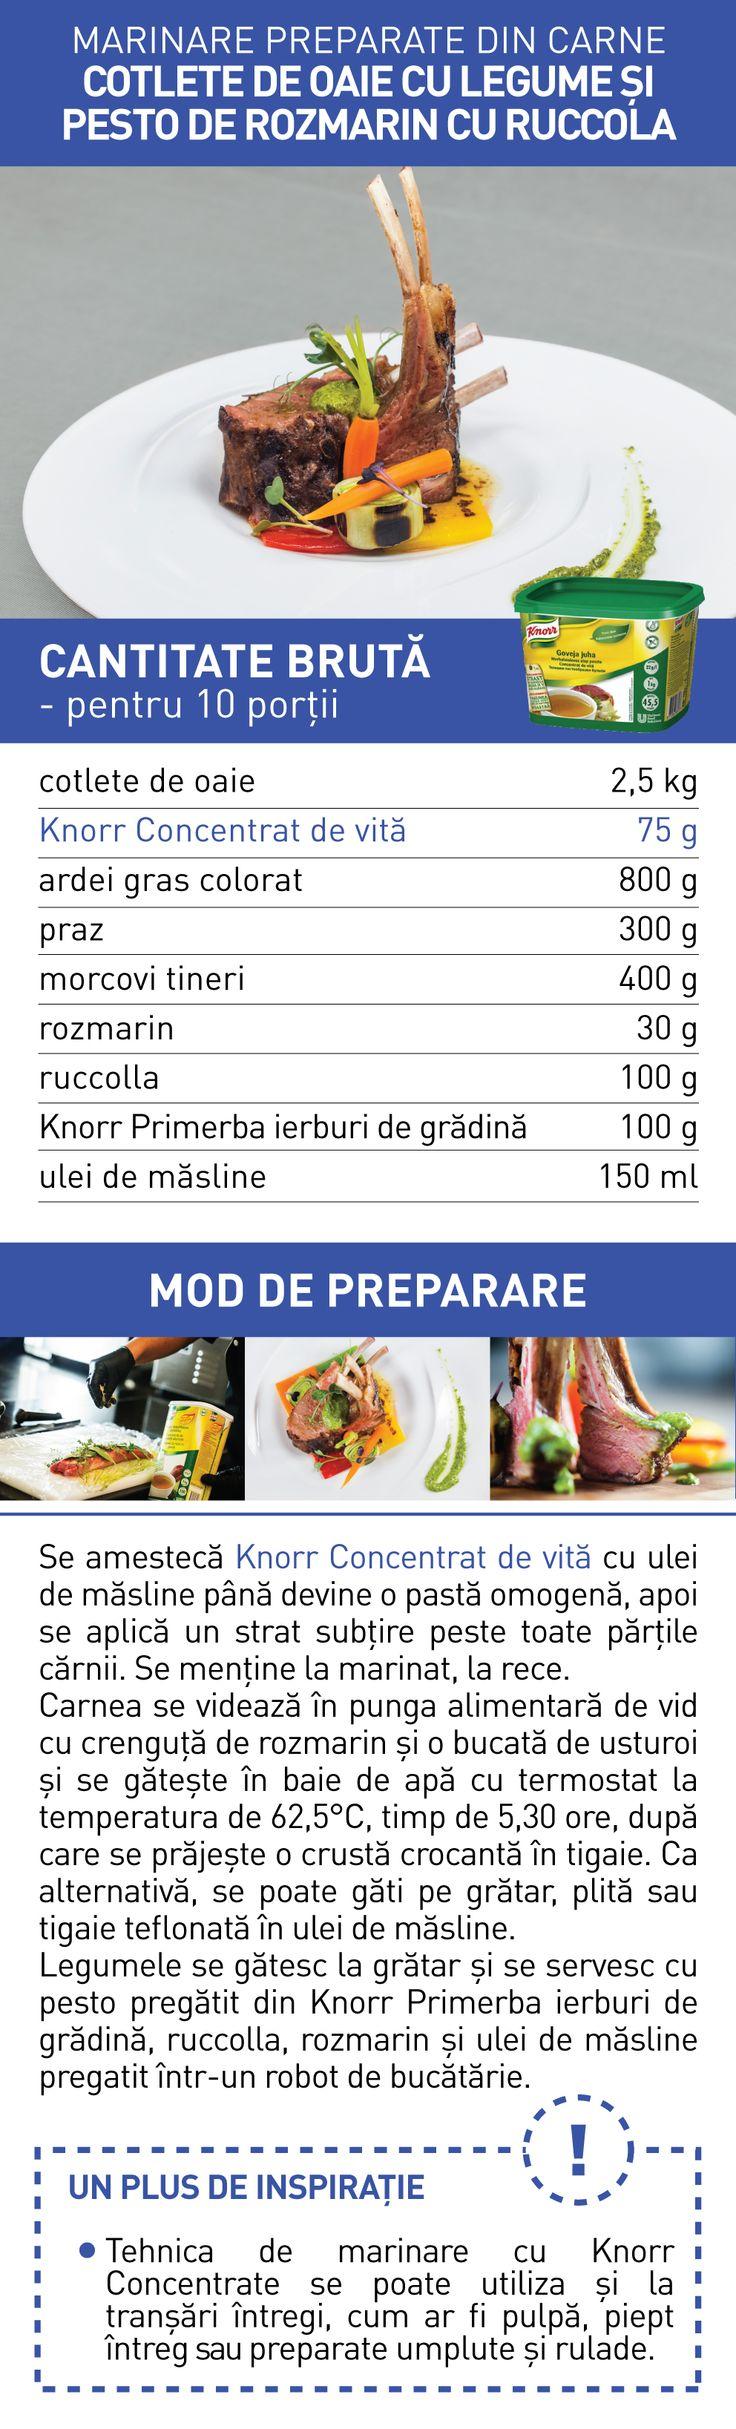 Marinare preparate din carne (II) - RETETE